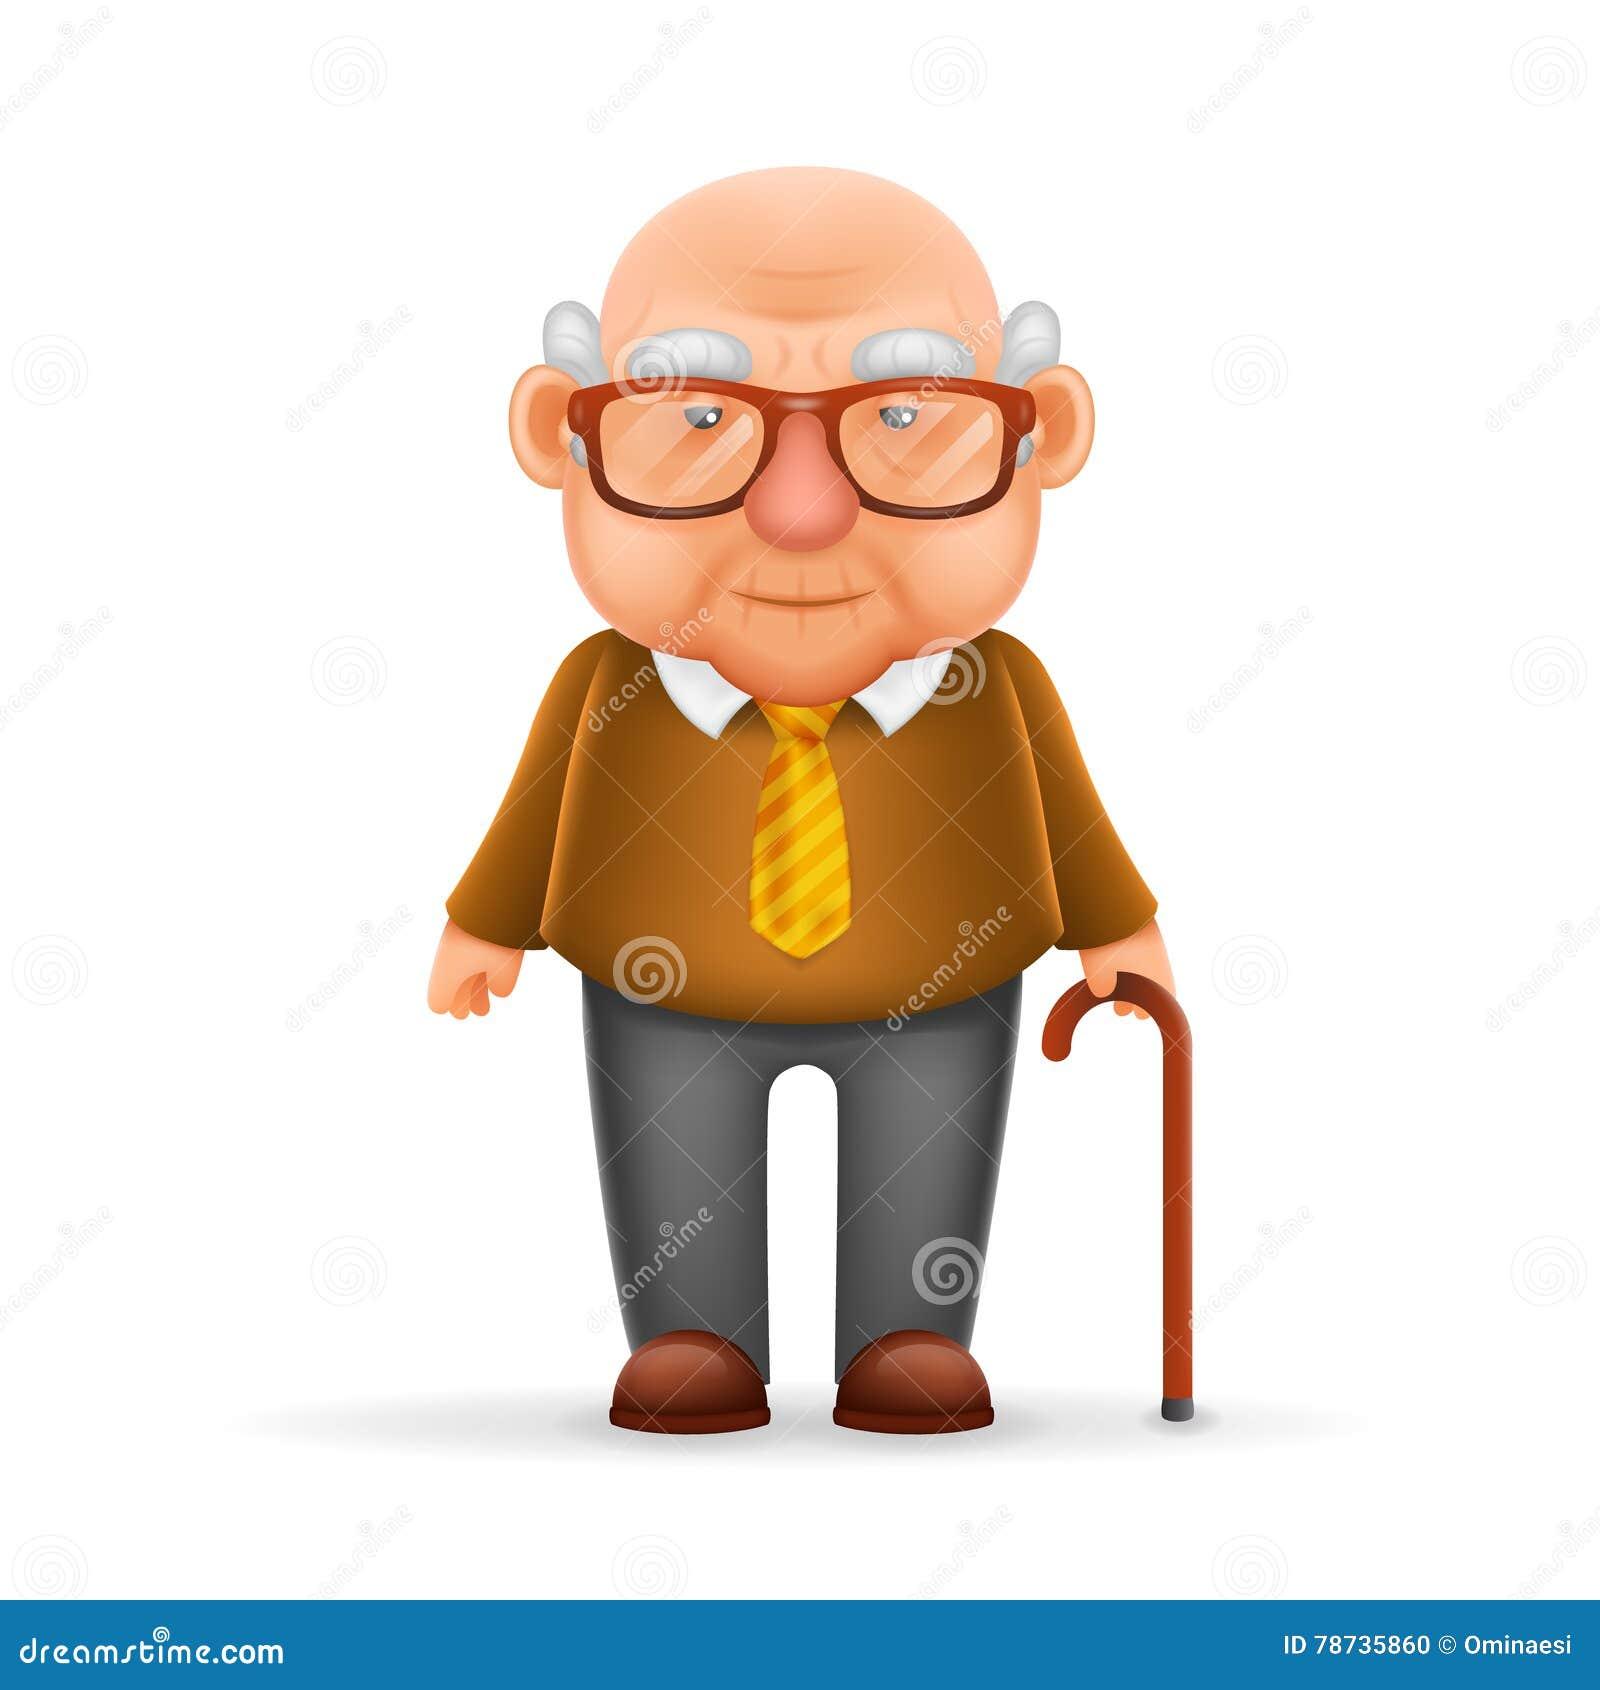 Cartoon Character Design In Illustrator : Old man grandfather d realistic cartoon character design